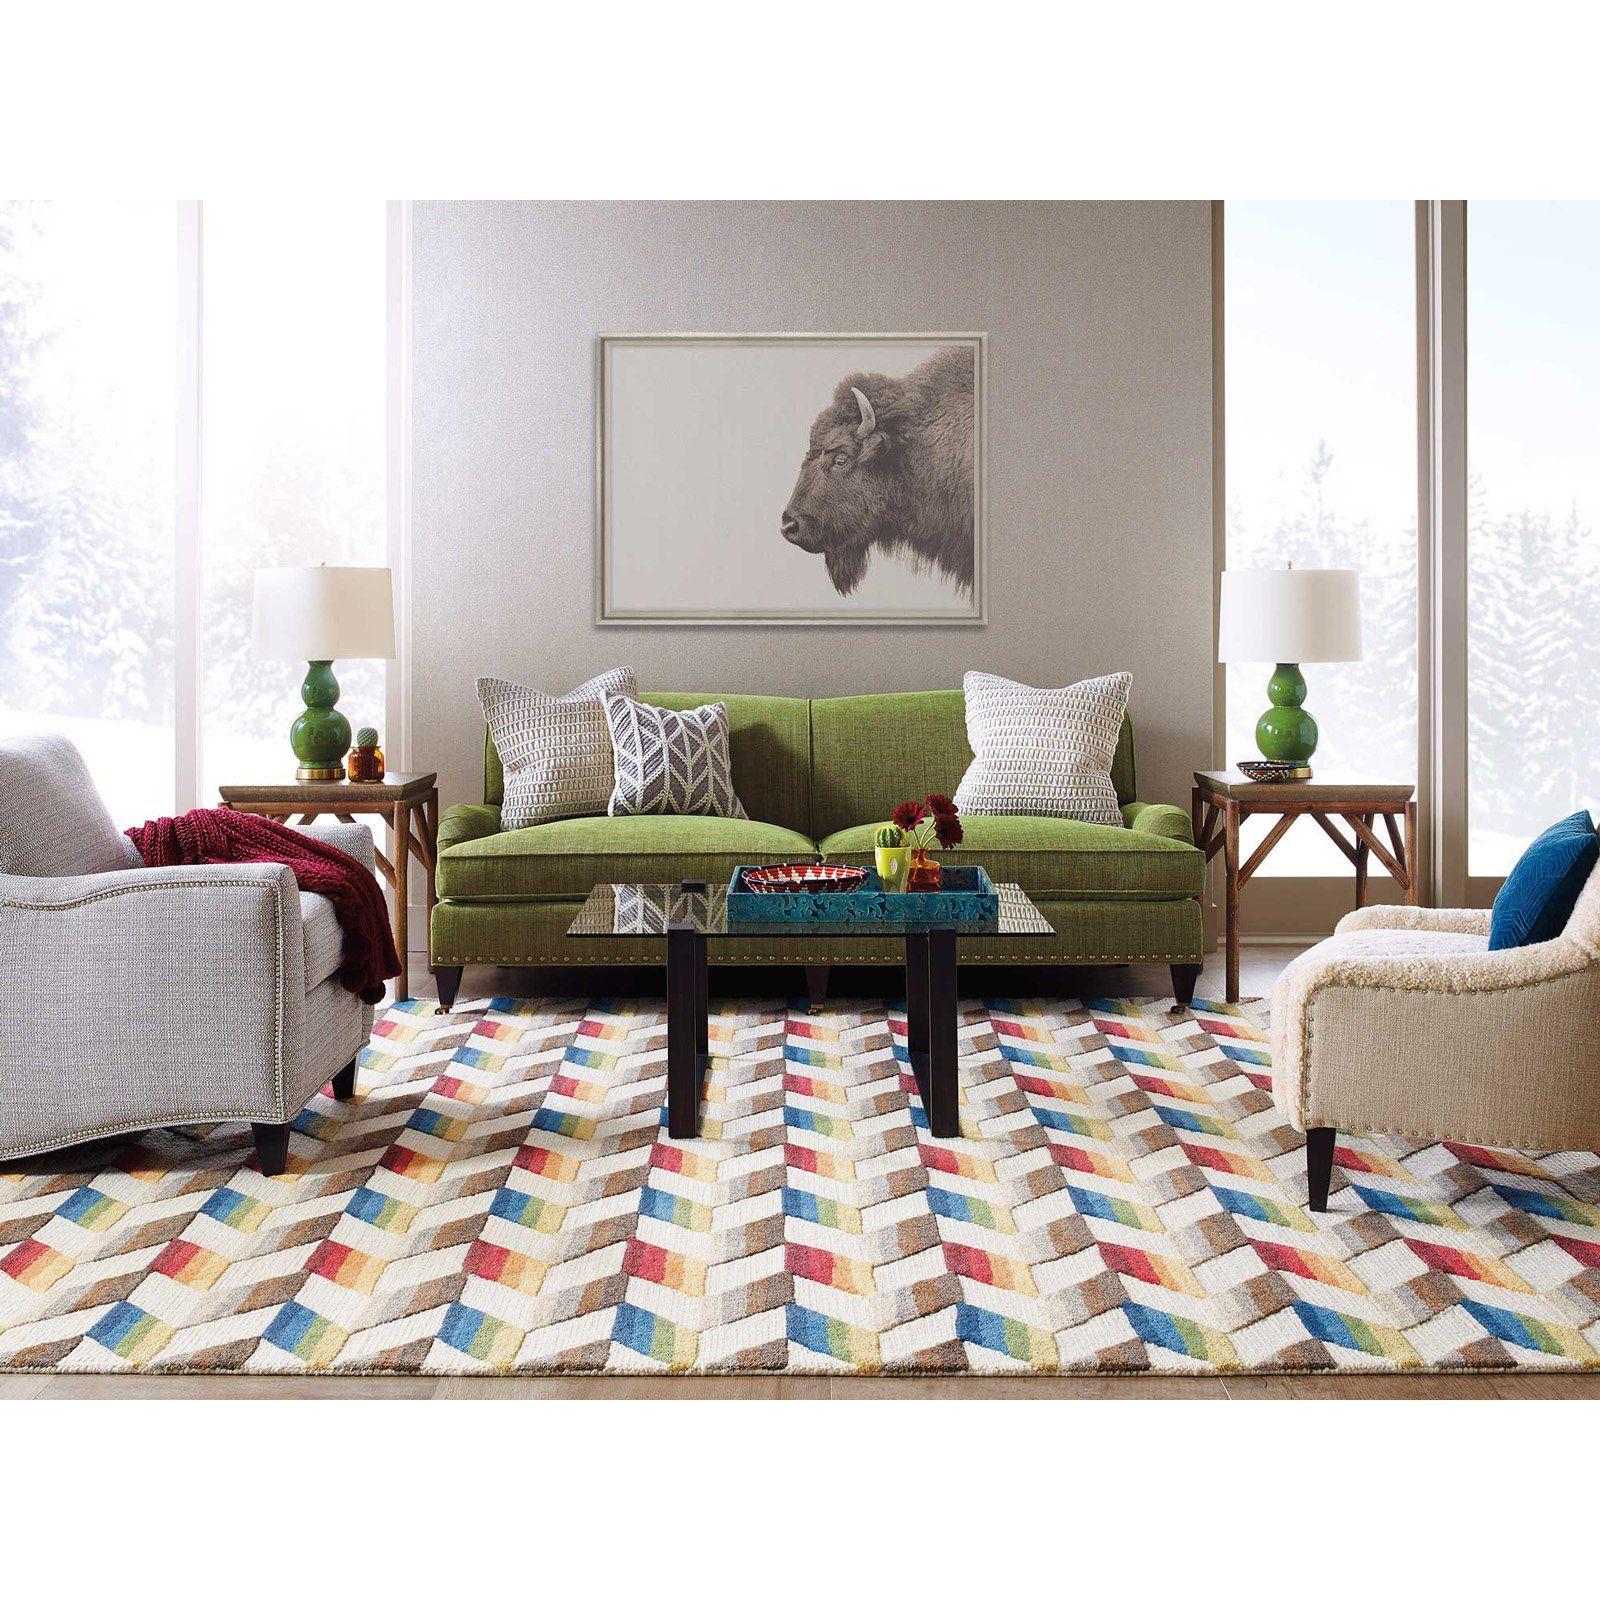 Company C Winnipeg Indoor Area Rug In 2019 Products Rugs